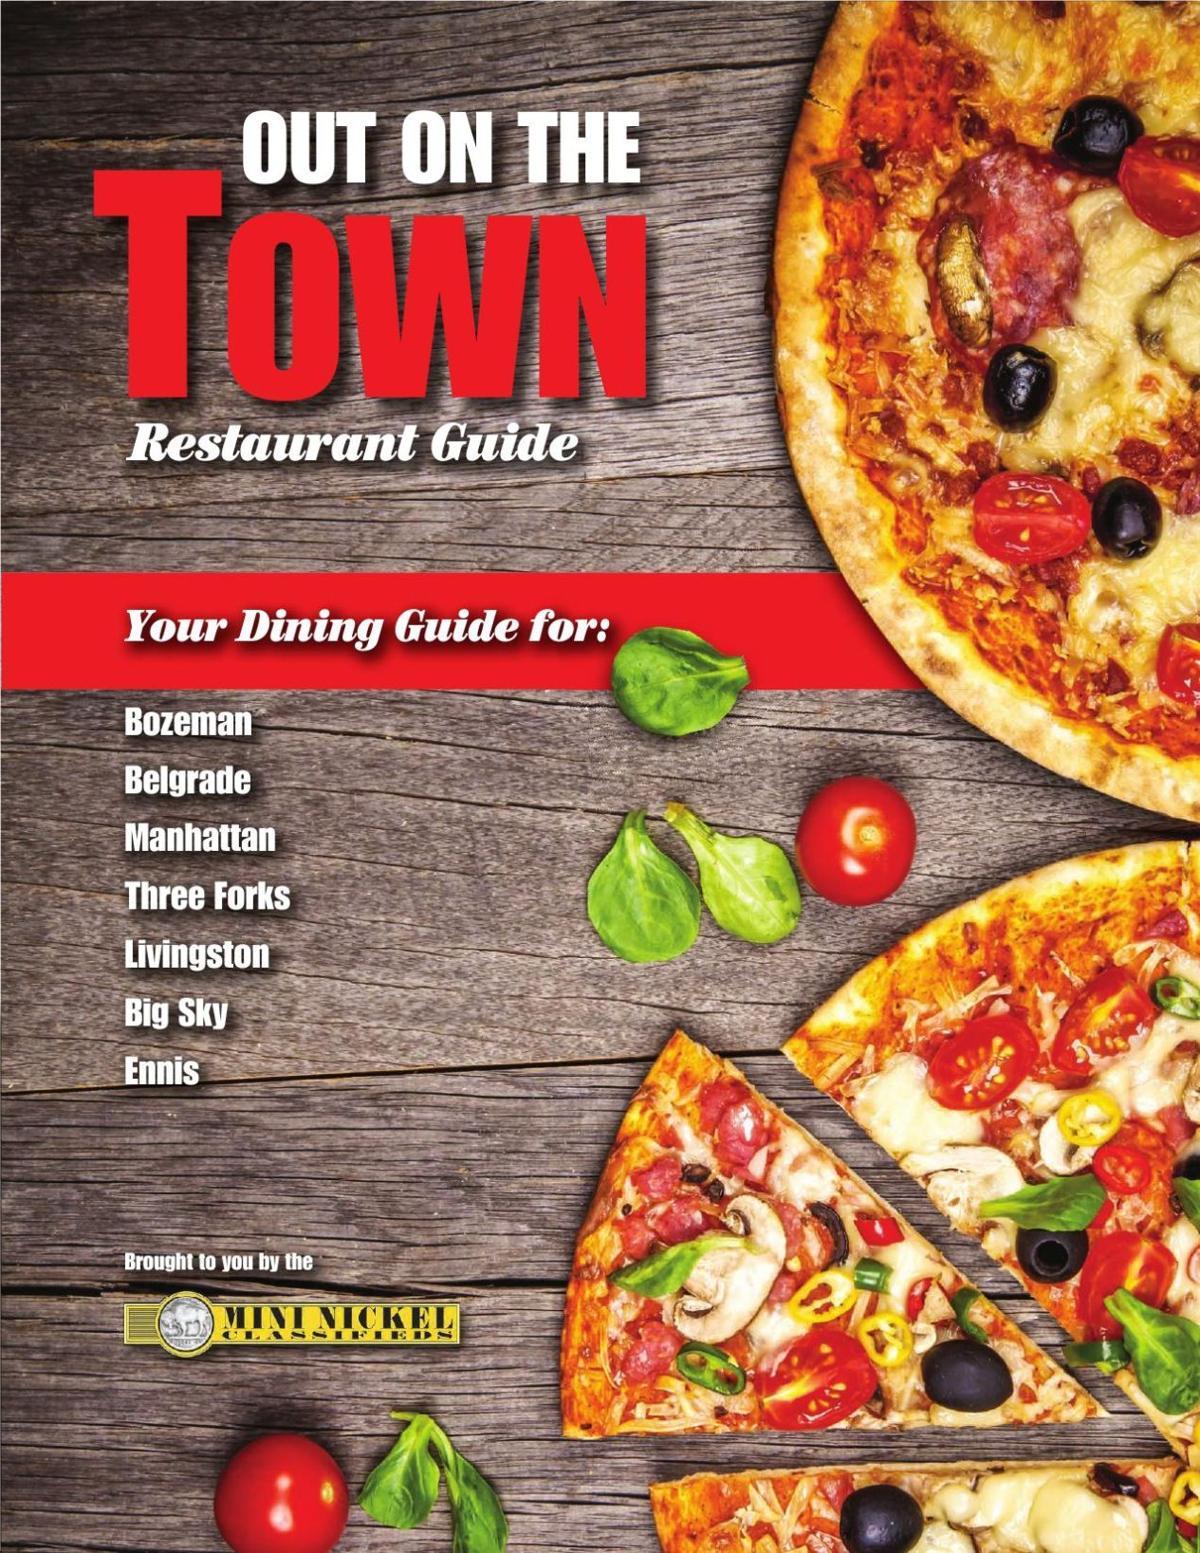 Mini Nickel Restaurant Guide